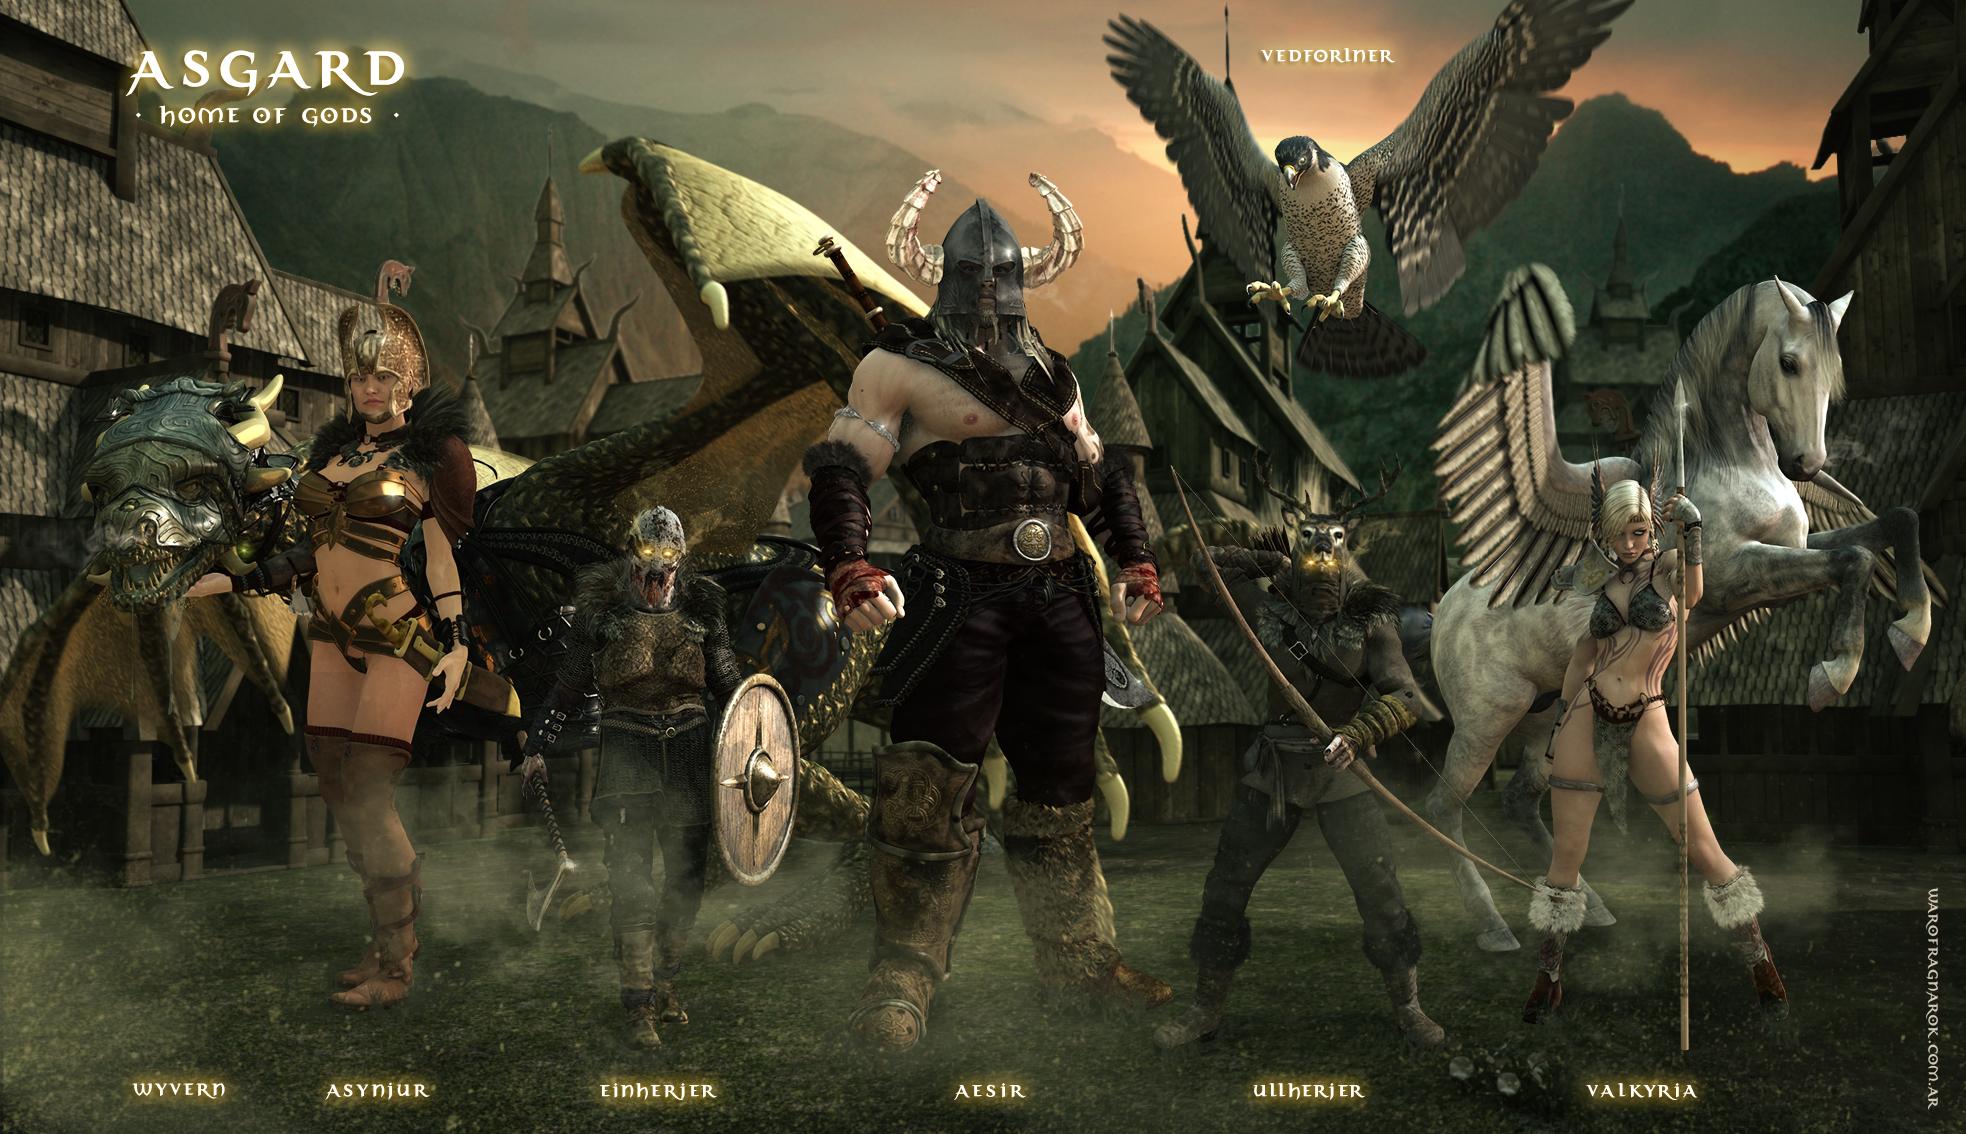 Asgard - Home of Gods by warofragnarok